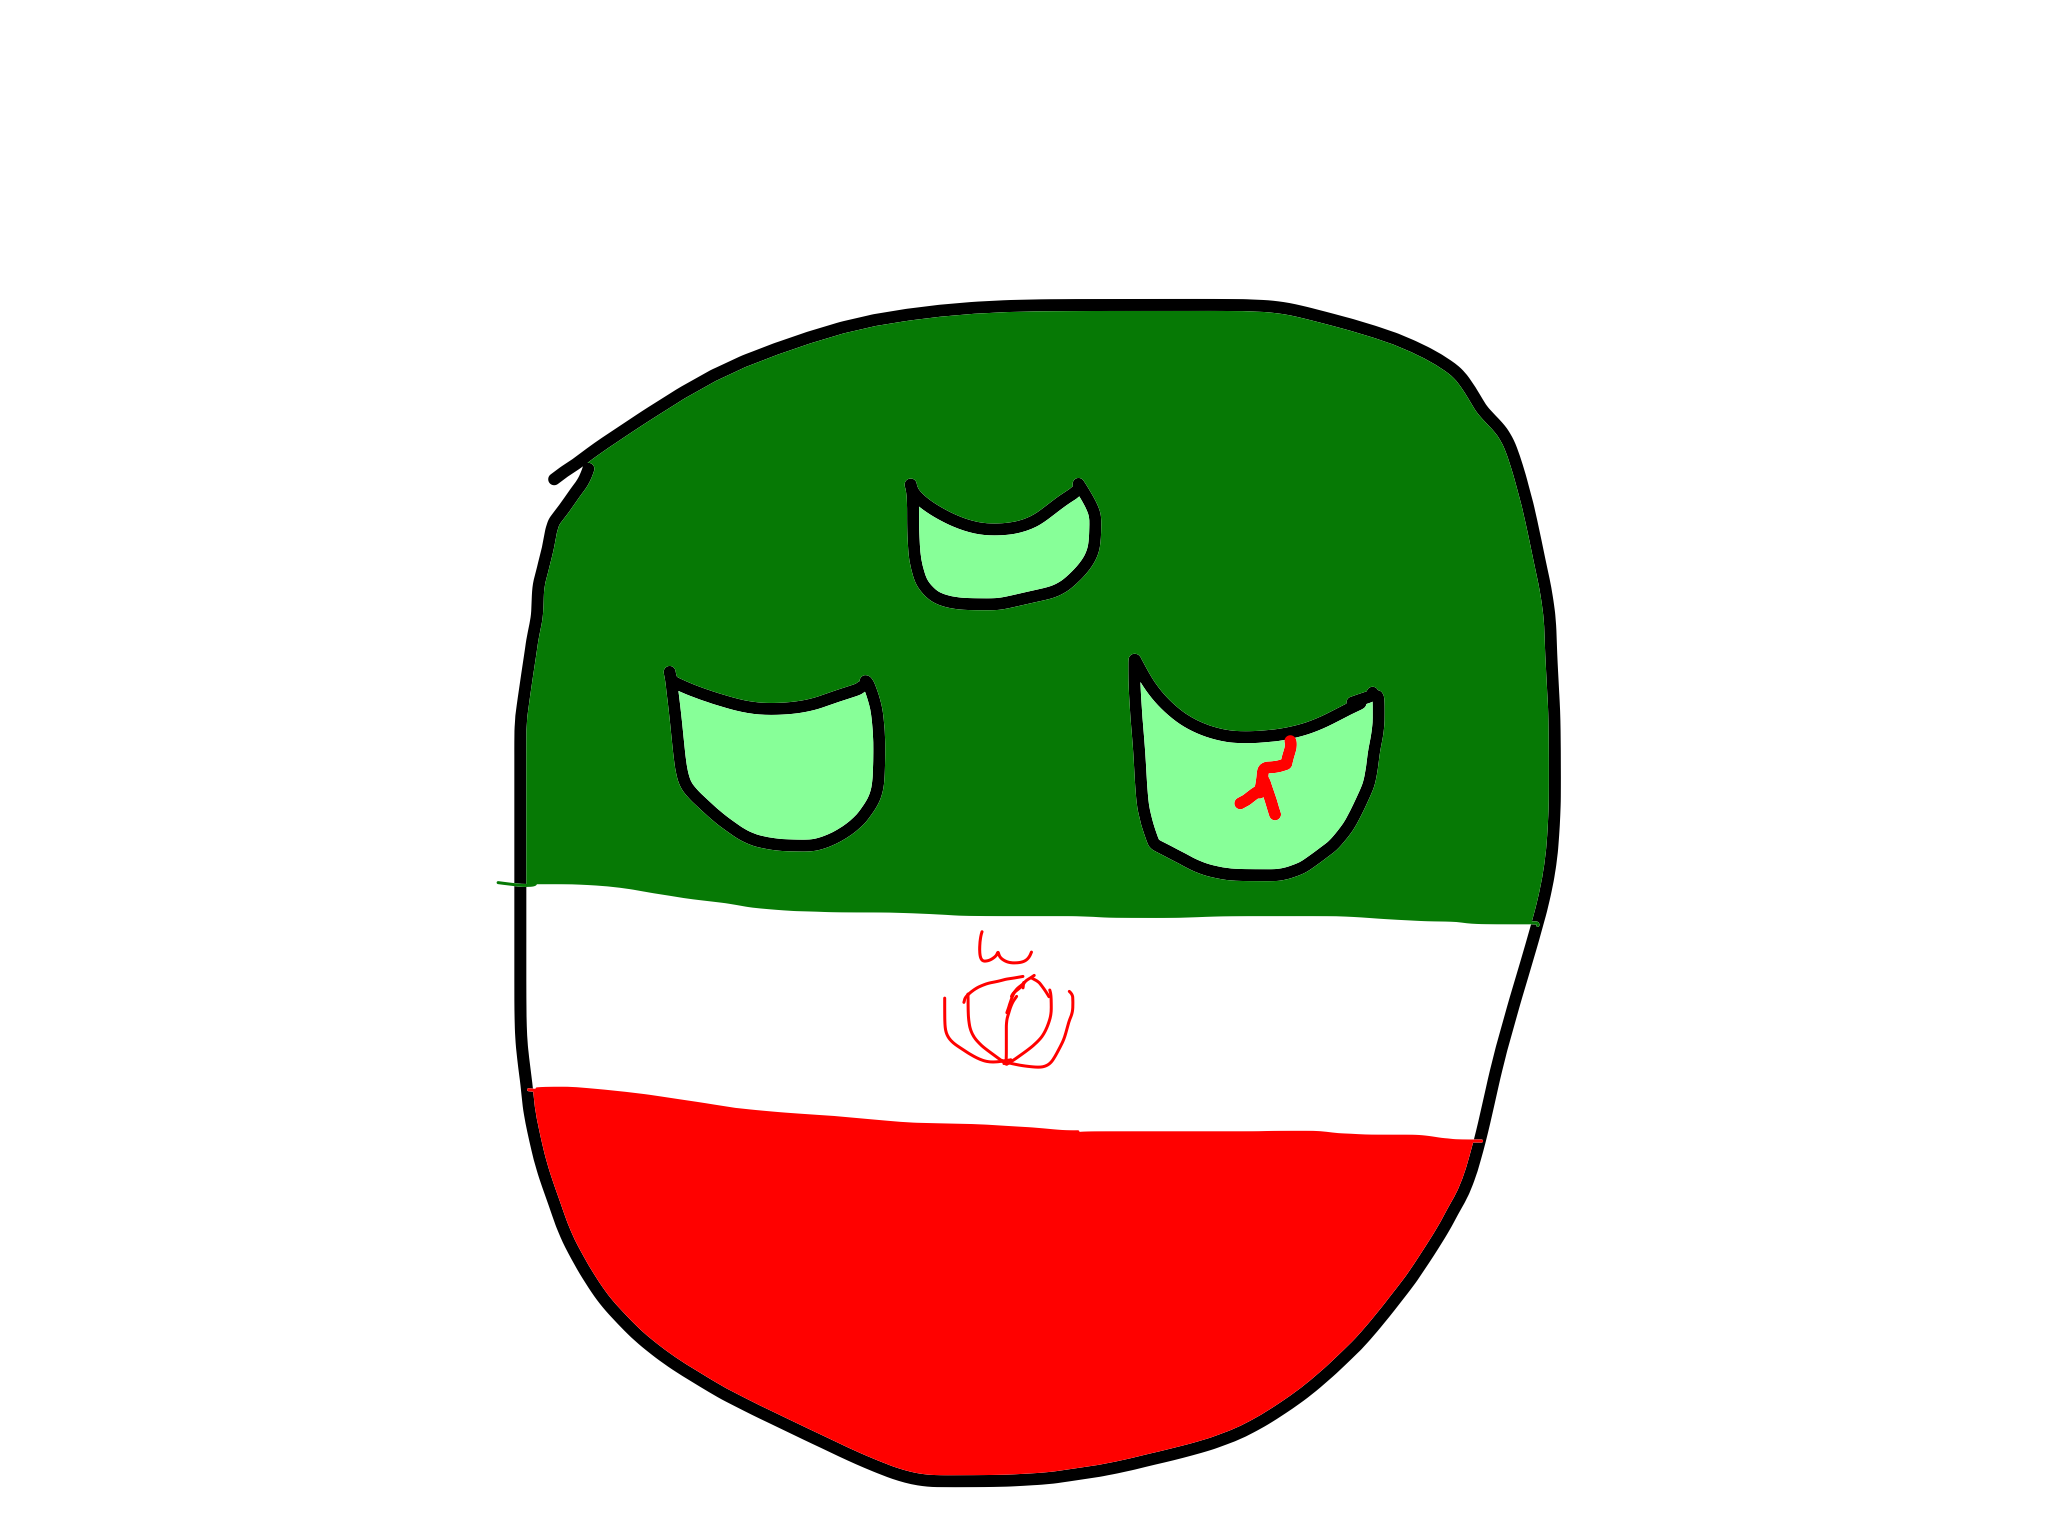 Natanzball